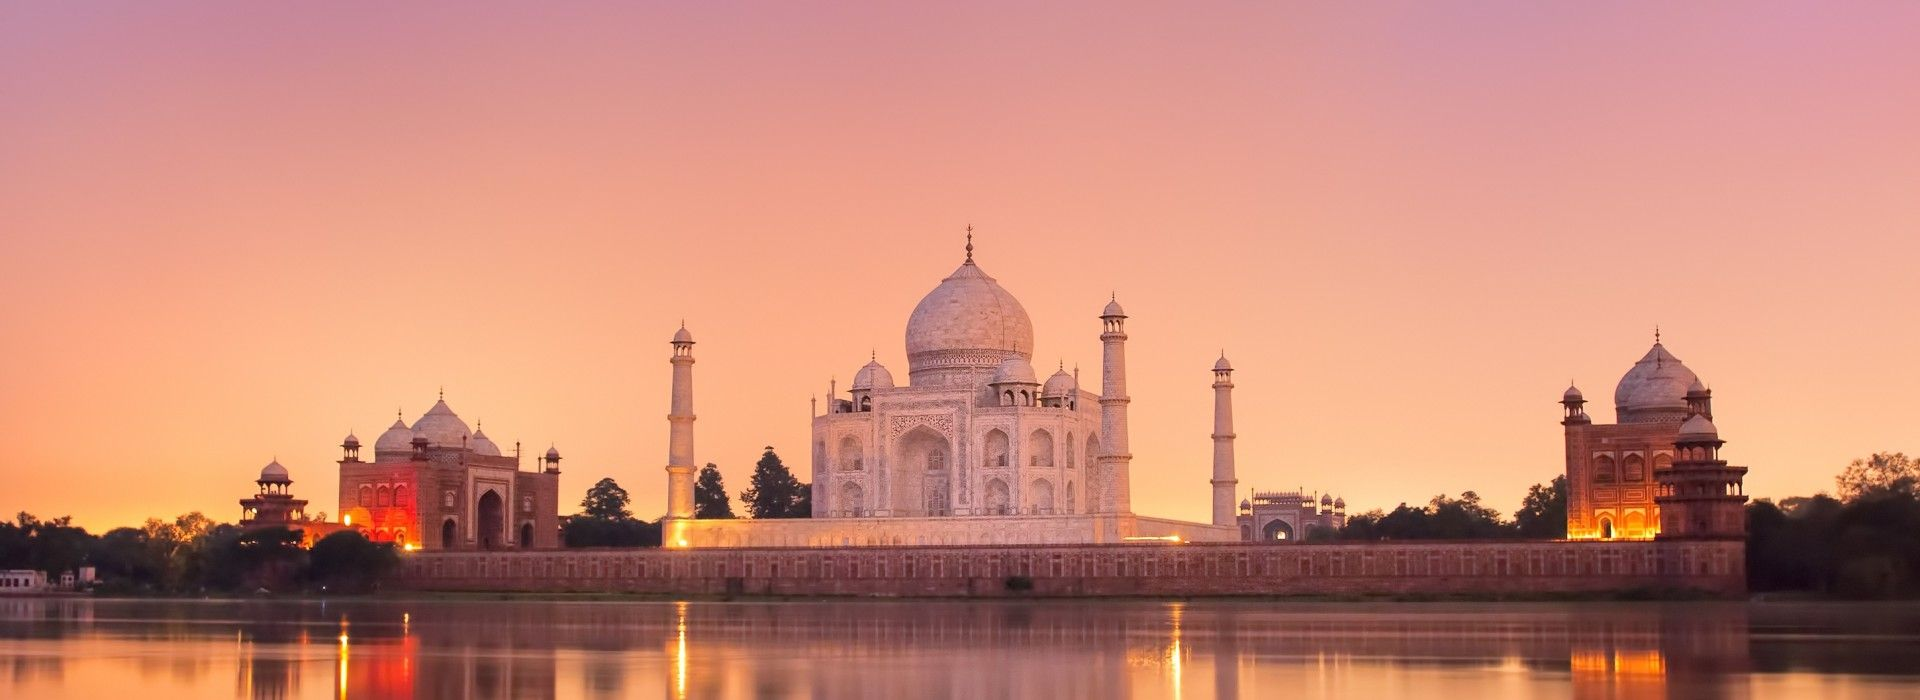 Art and architecture Tours in Varanasi